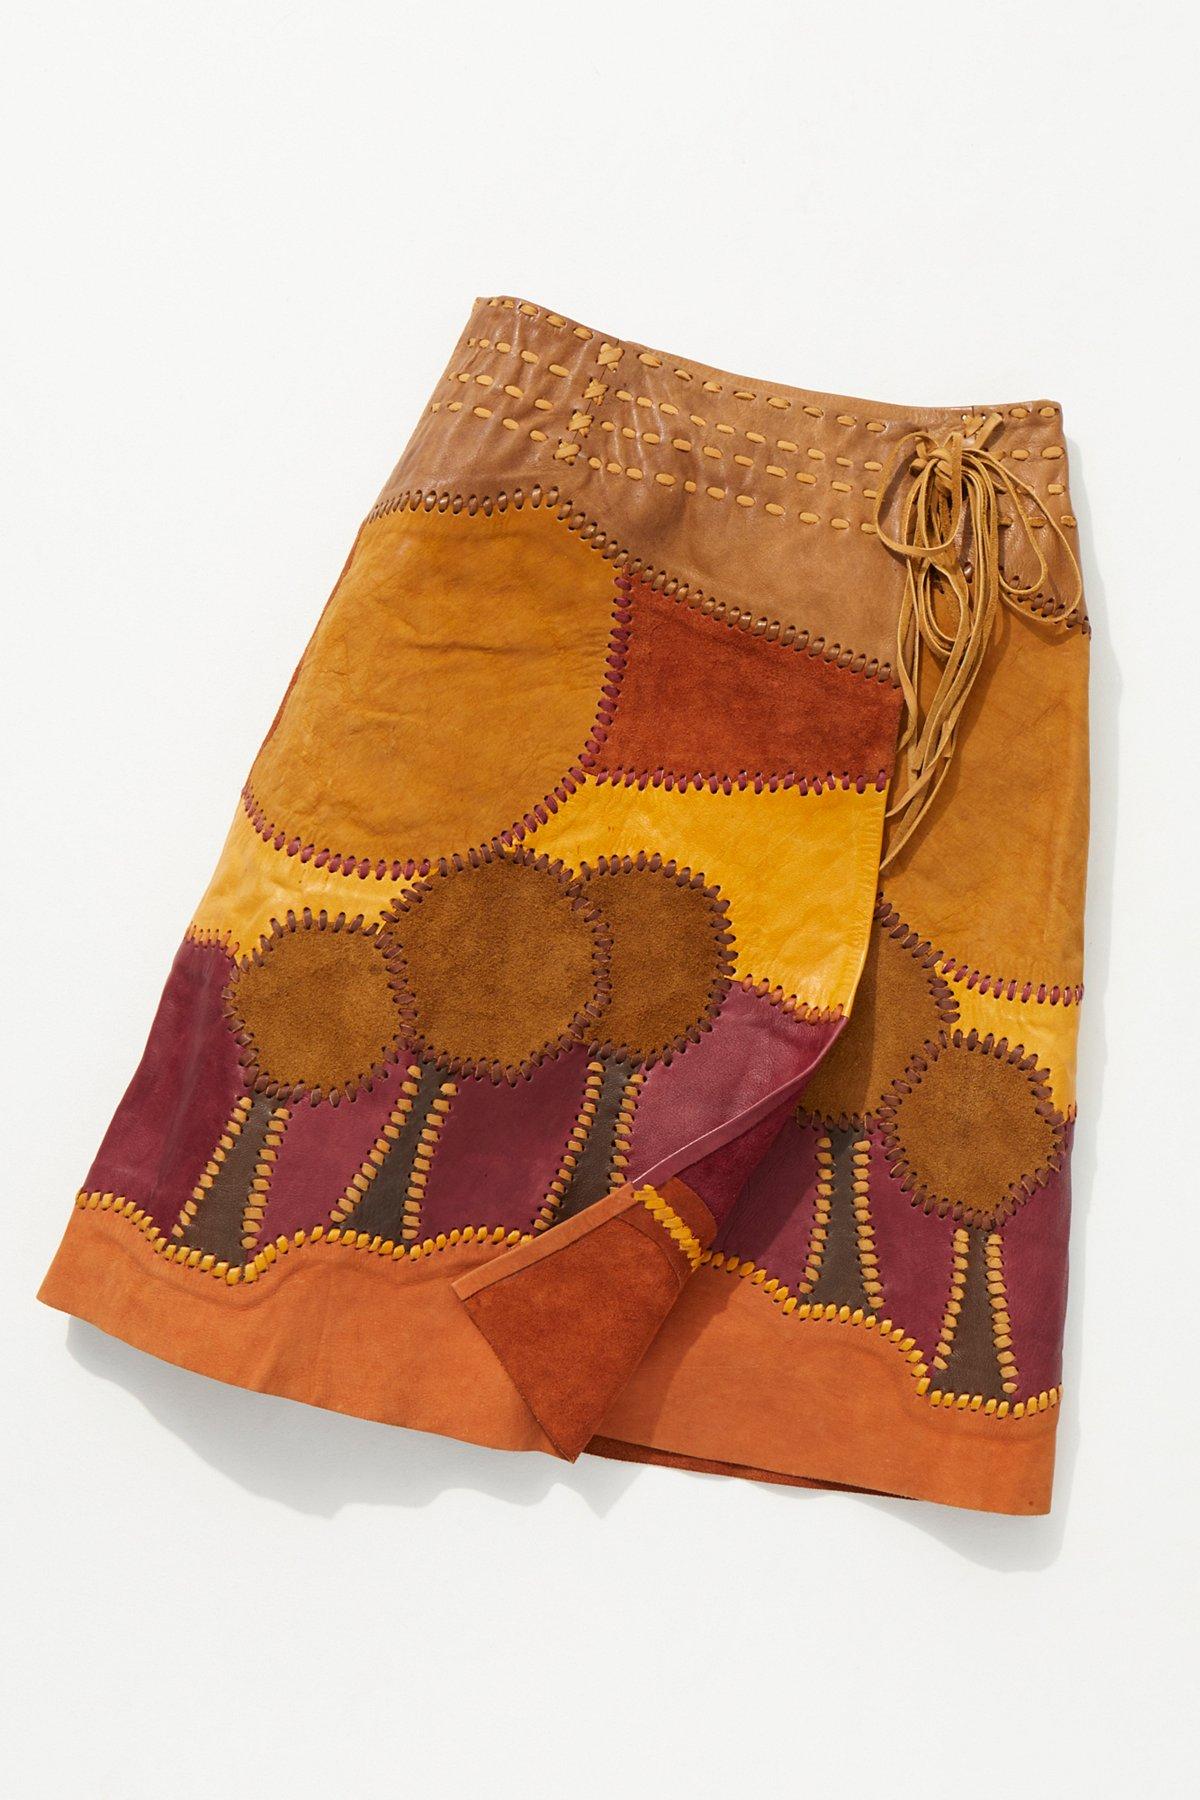 Vintage 1960s Handmade Suede Patchwork Skirt